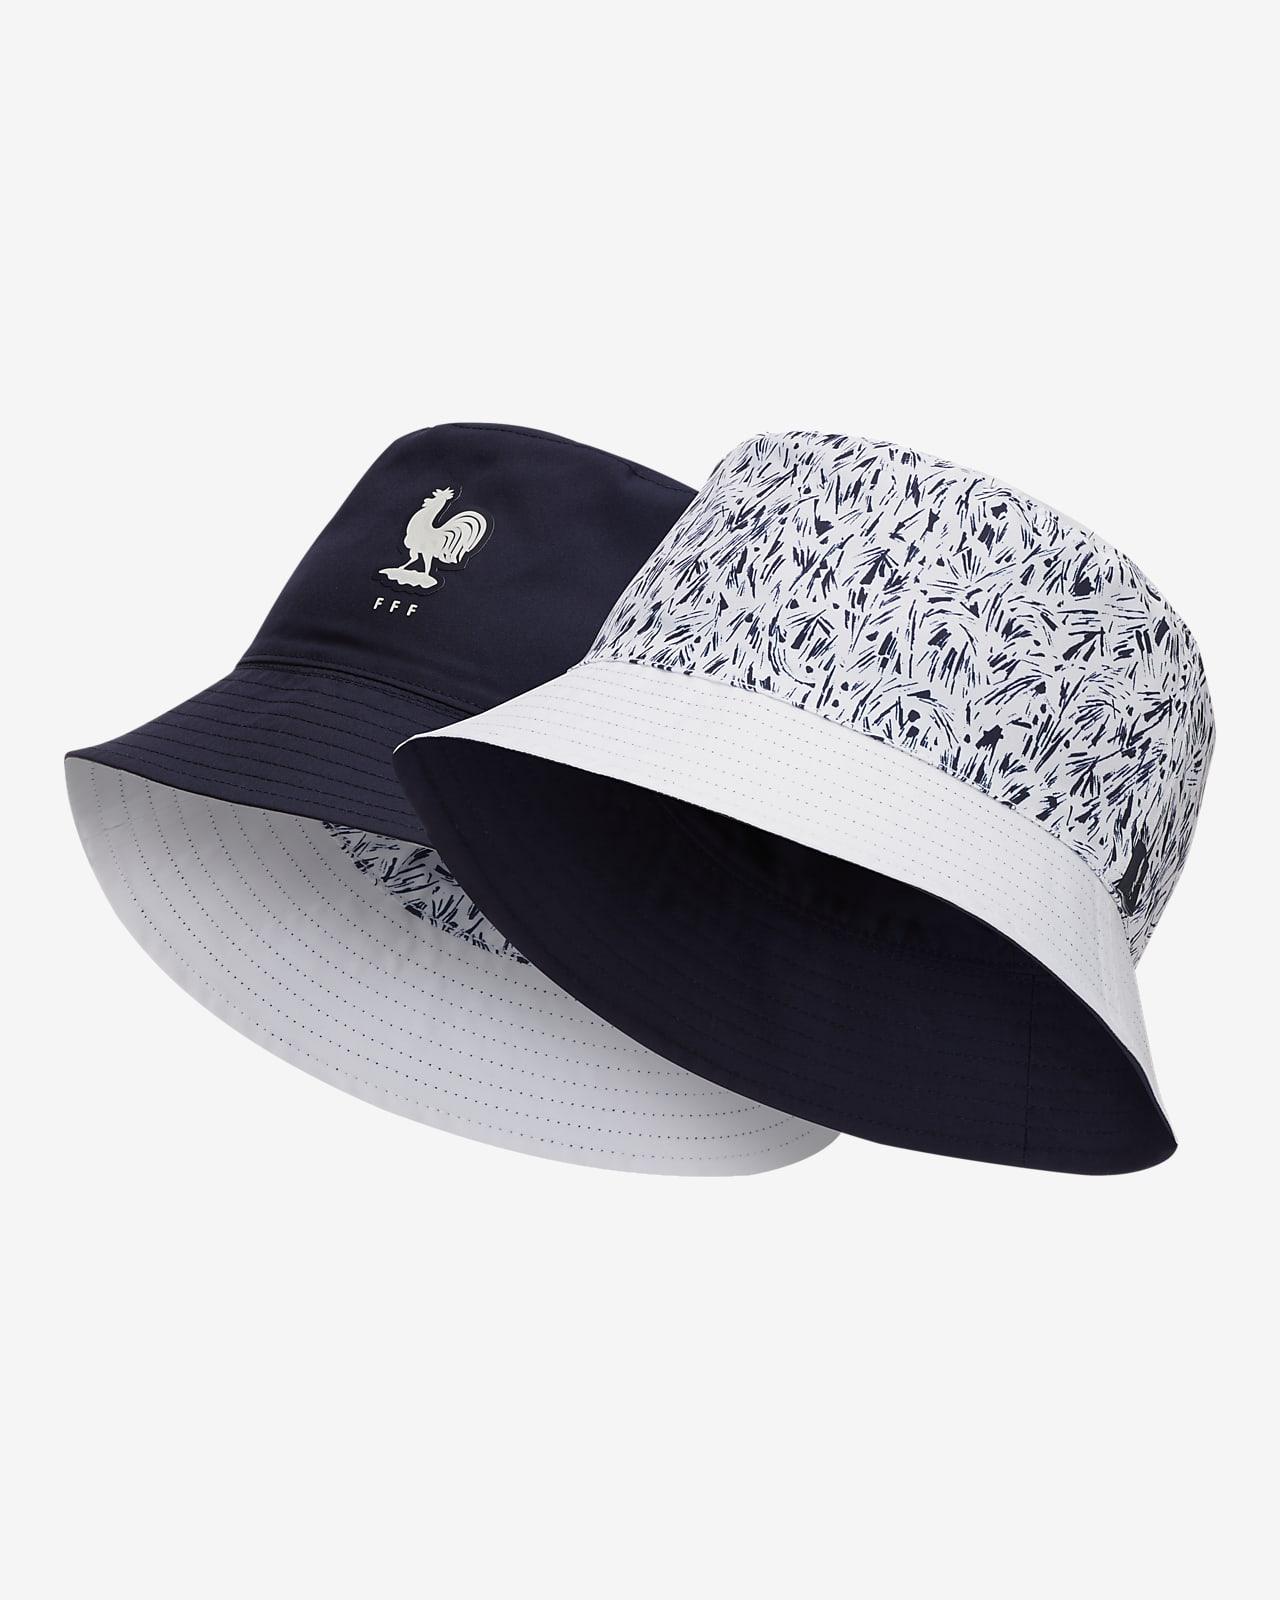 FFF Reversible Bucket Hat